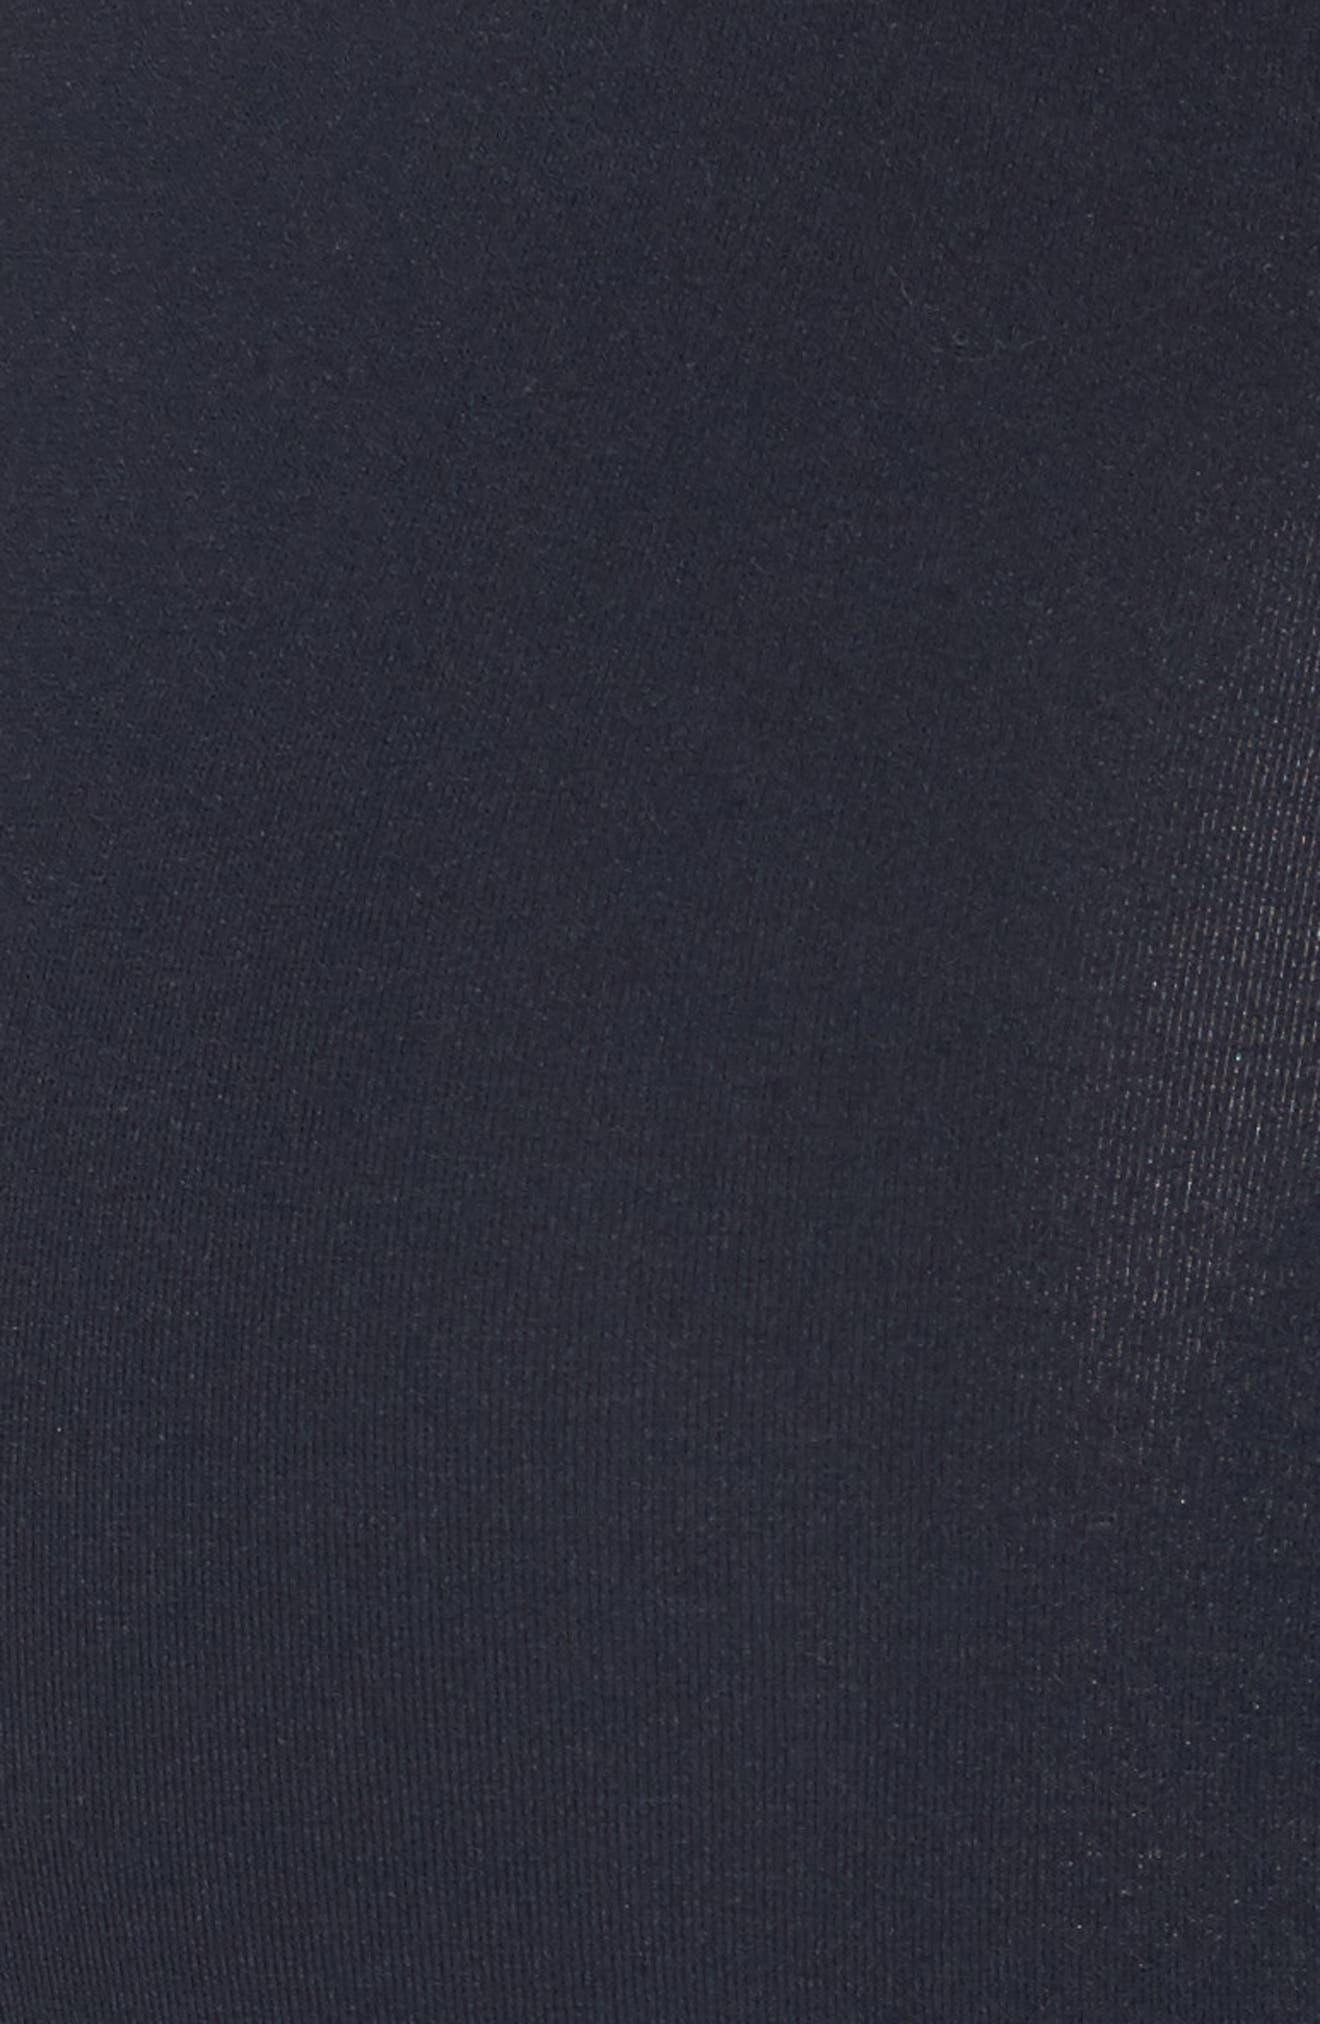 Alternate Image 5  - 1822 Denim Destructed Maternity Skinny Jeans (Hazel)